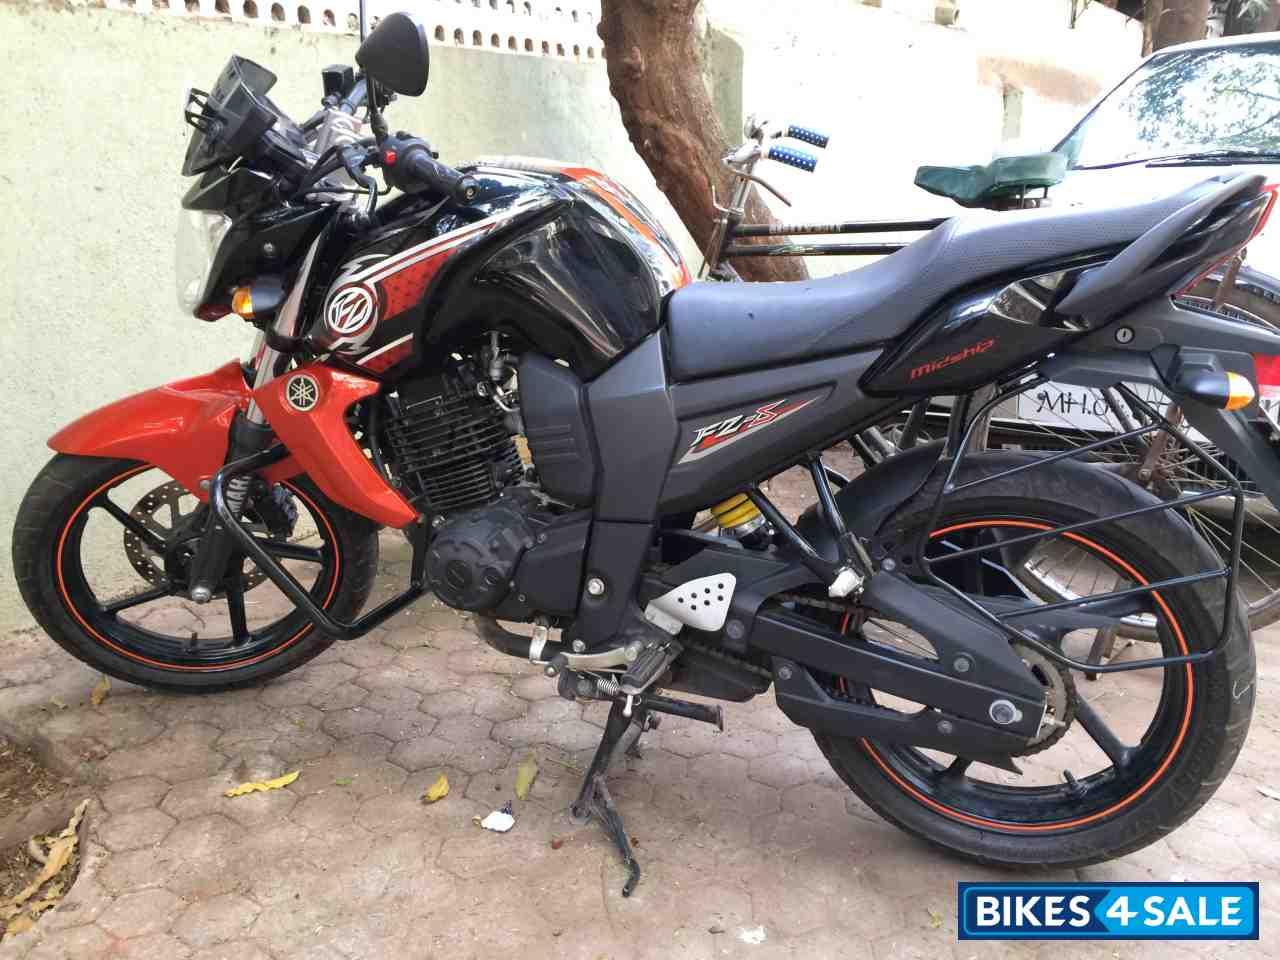 Yamaha Fzs For Sale In Mumbai